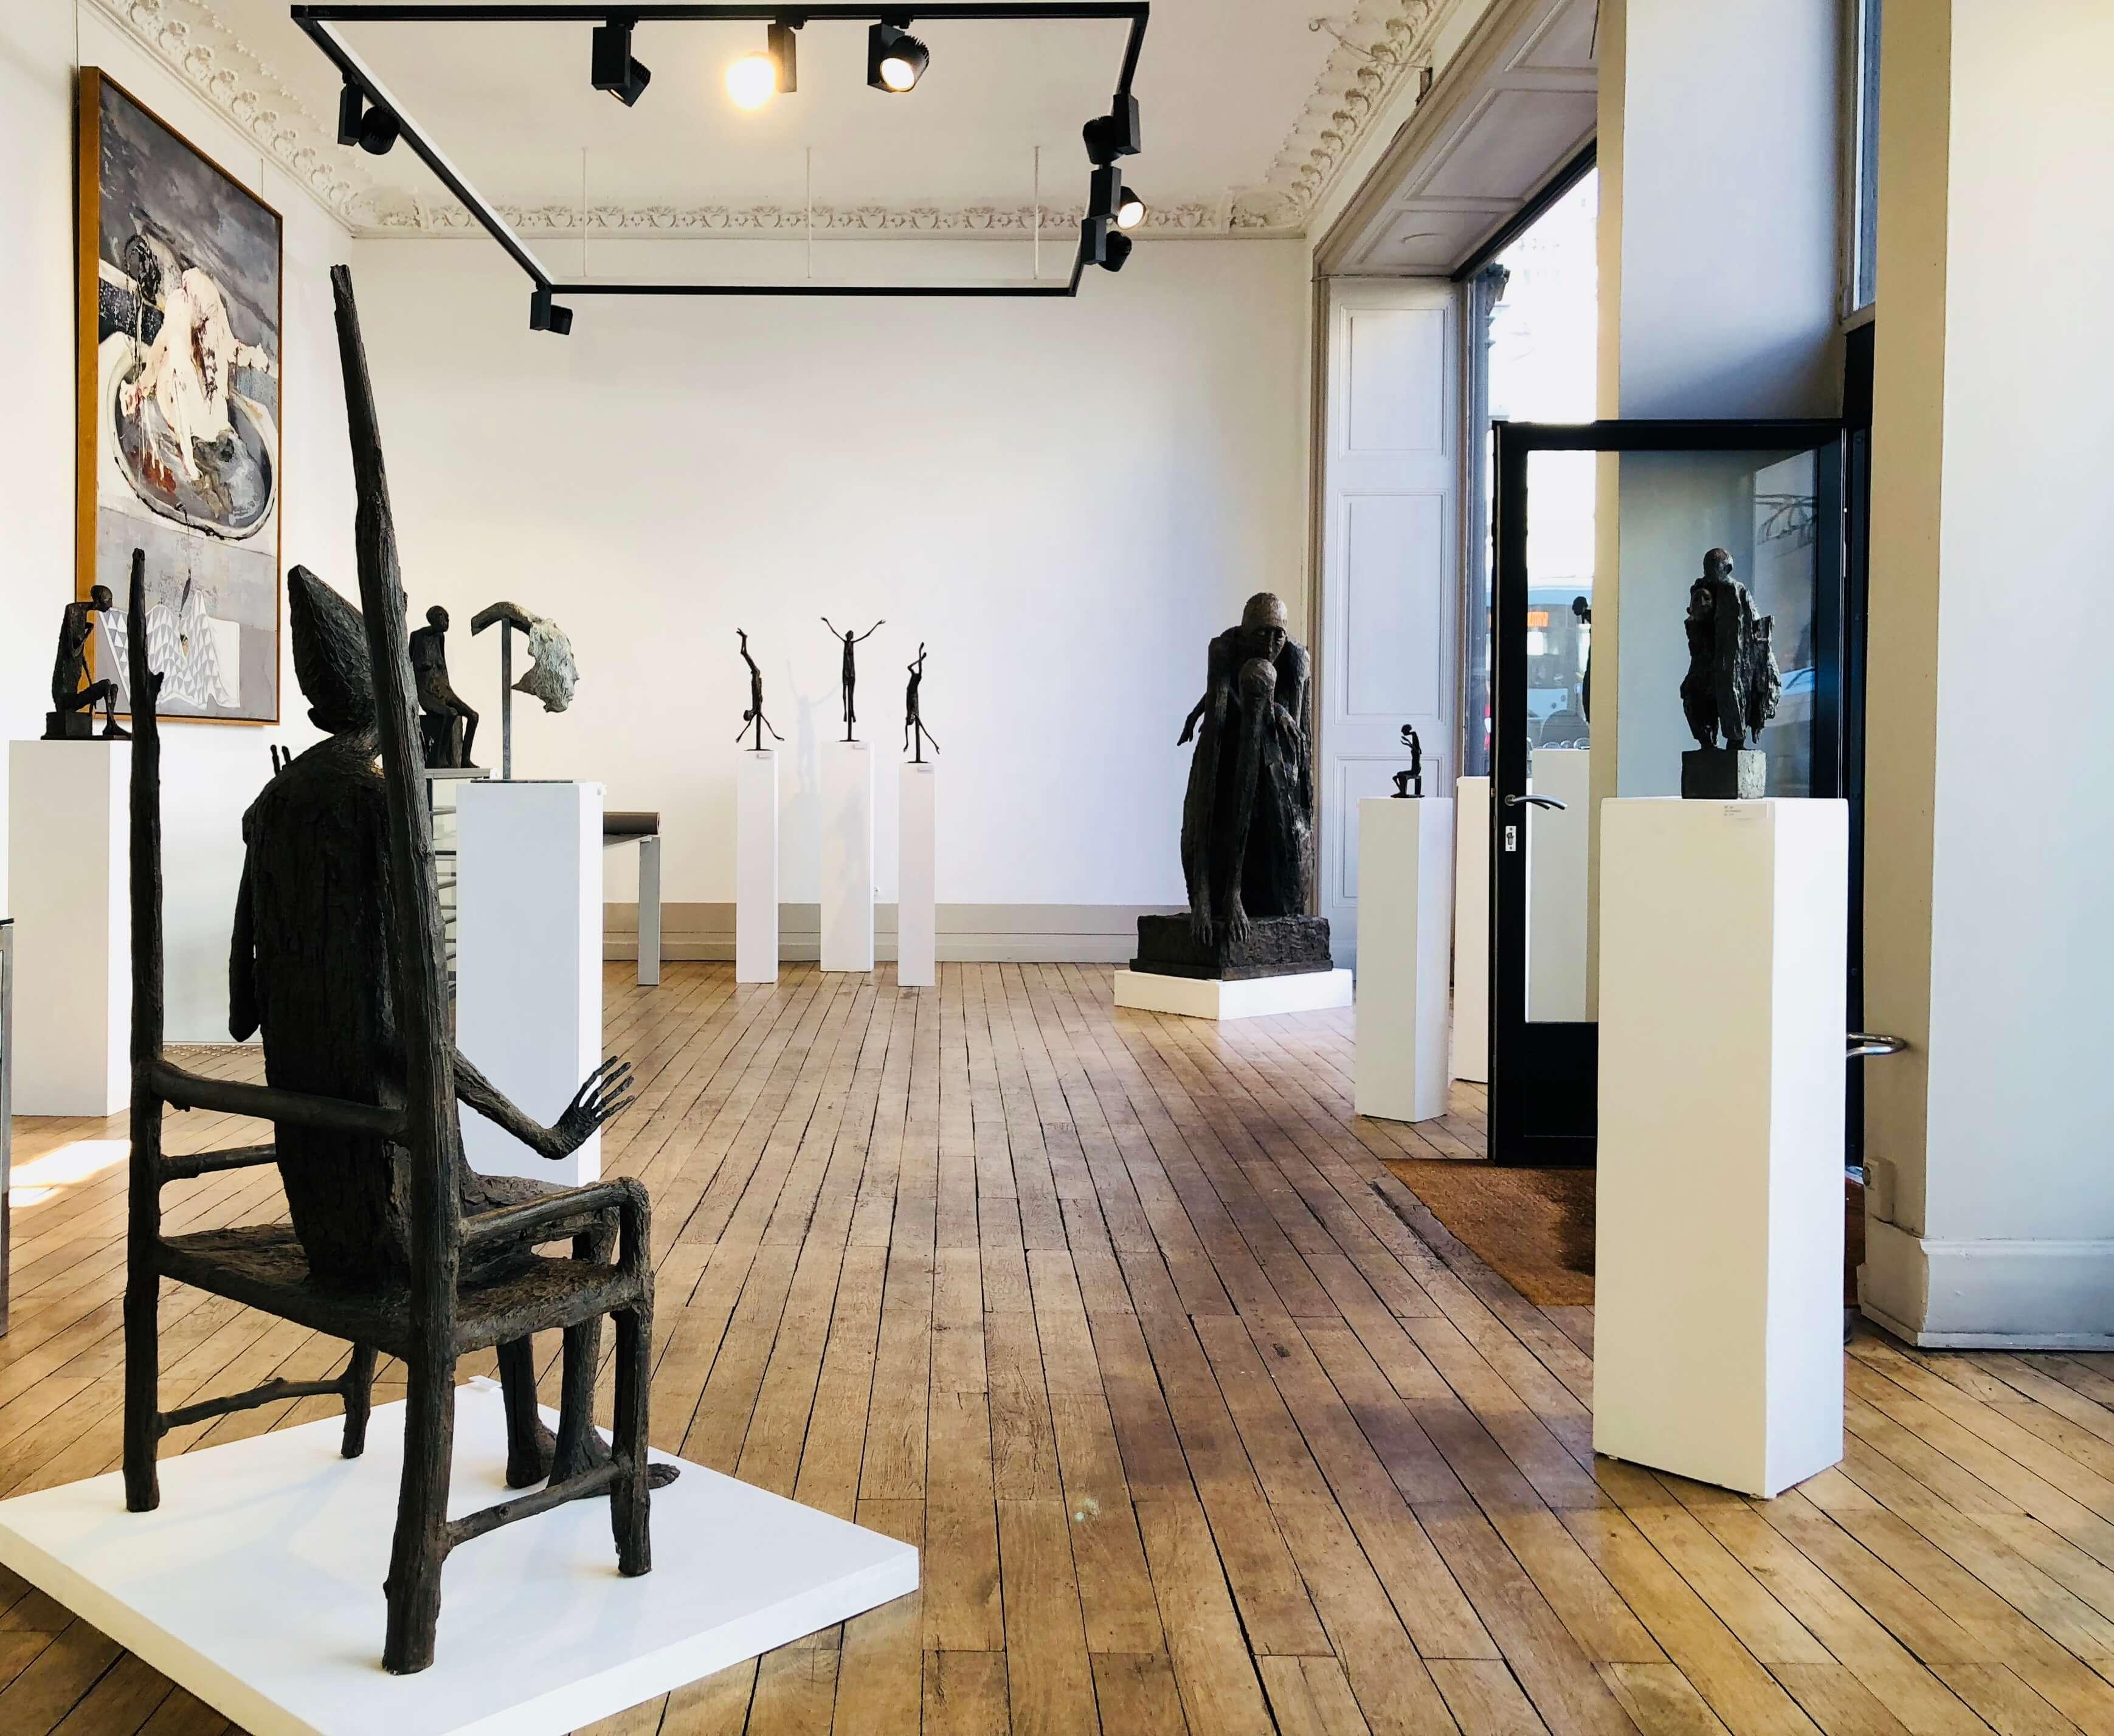 Image exposition Marc Petit Galerie Artset